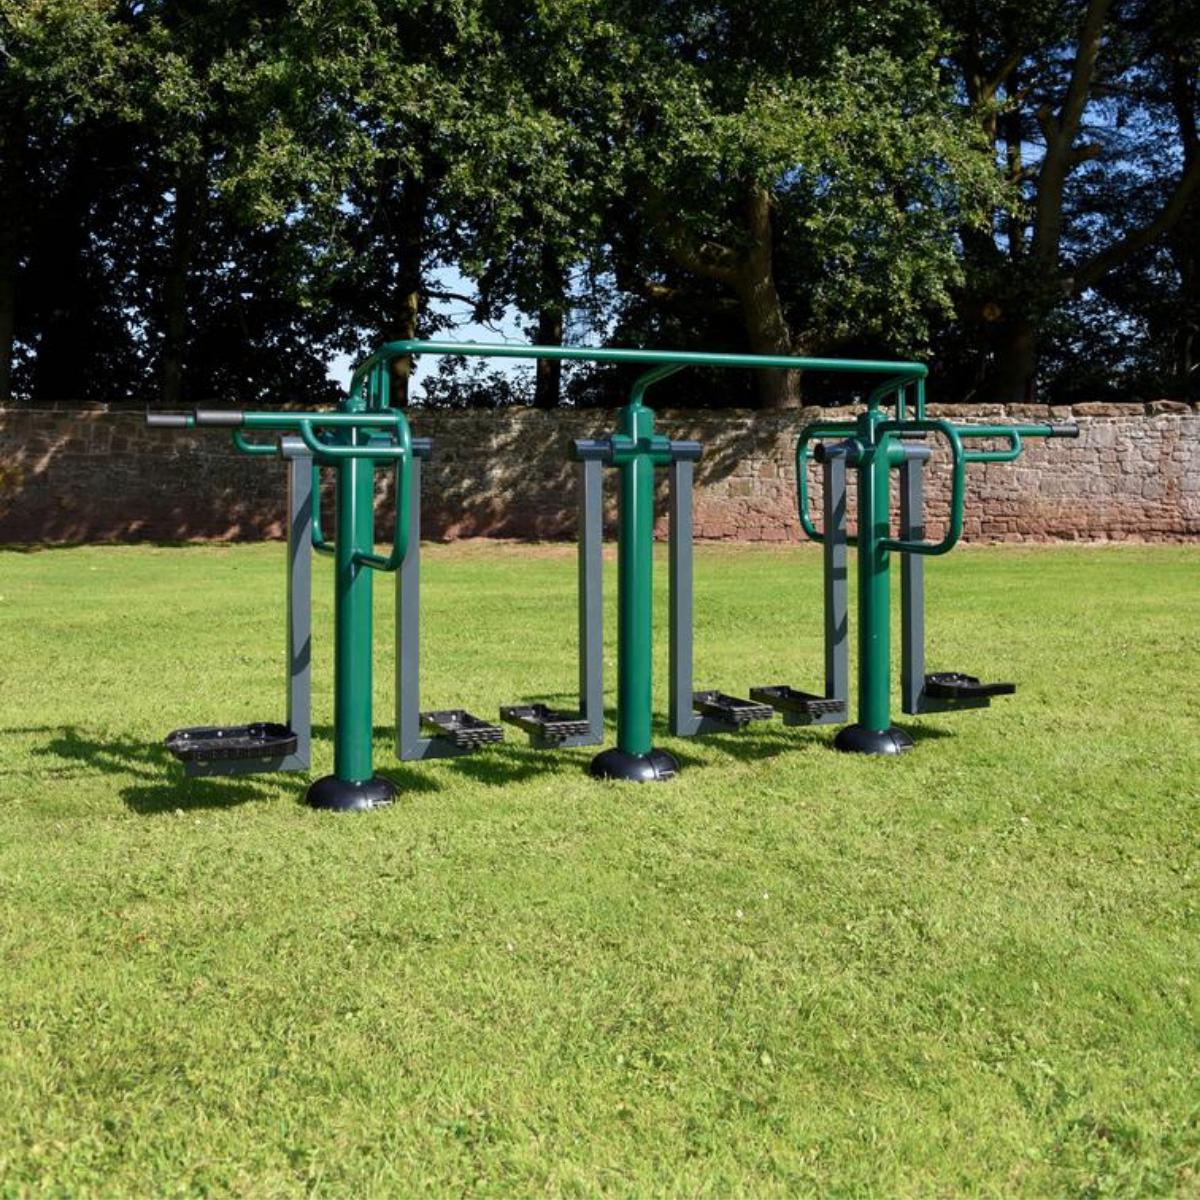 Energise Multi Gym   Sunshine Gym   Outdoor Gym Equipment